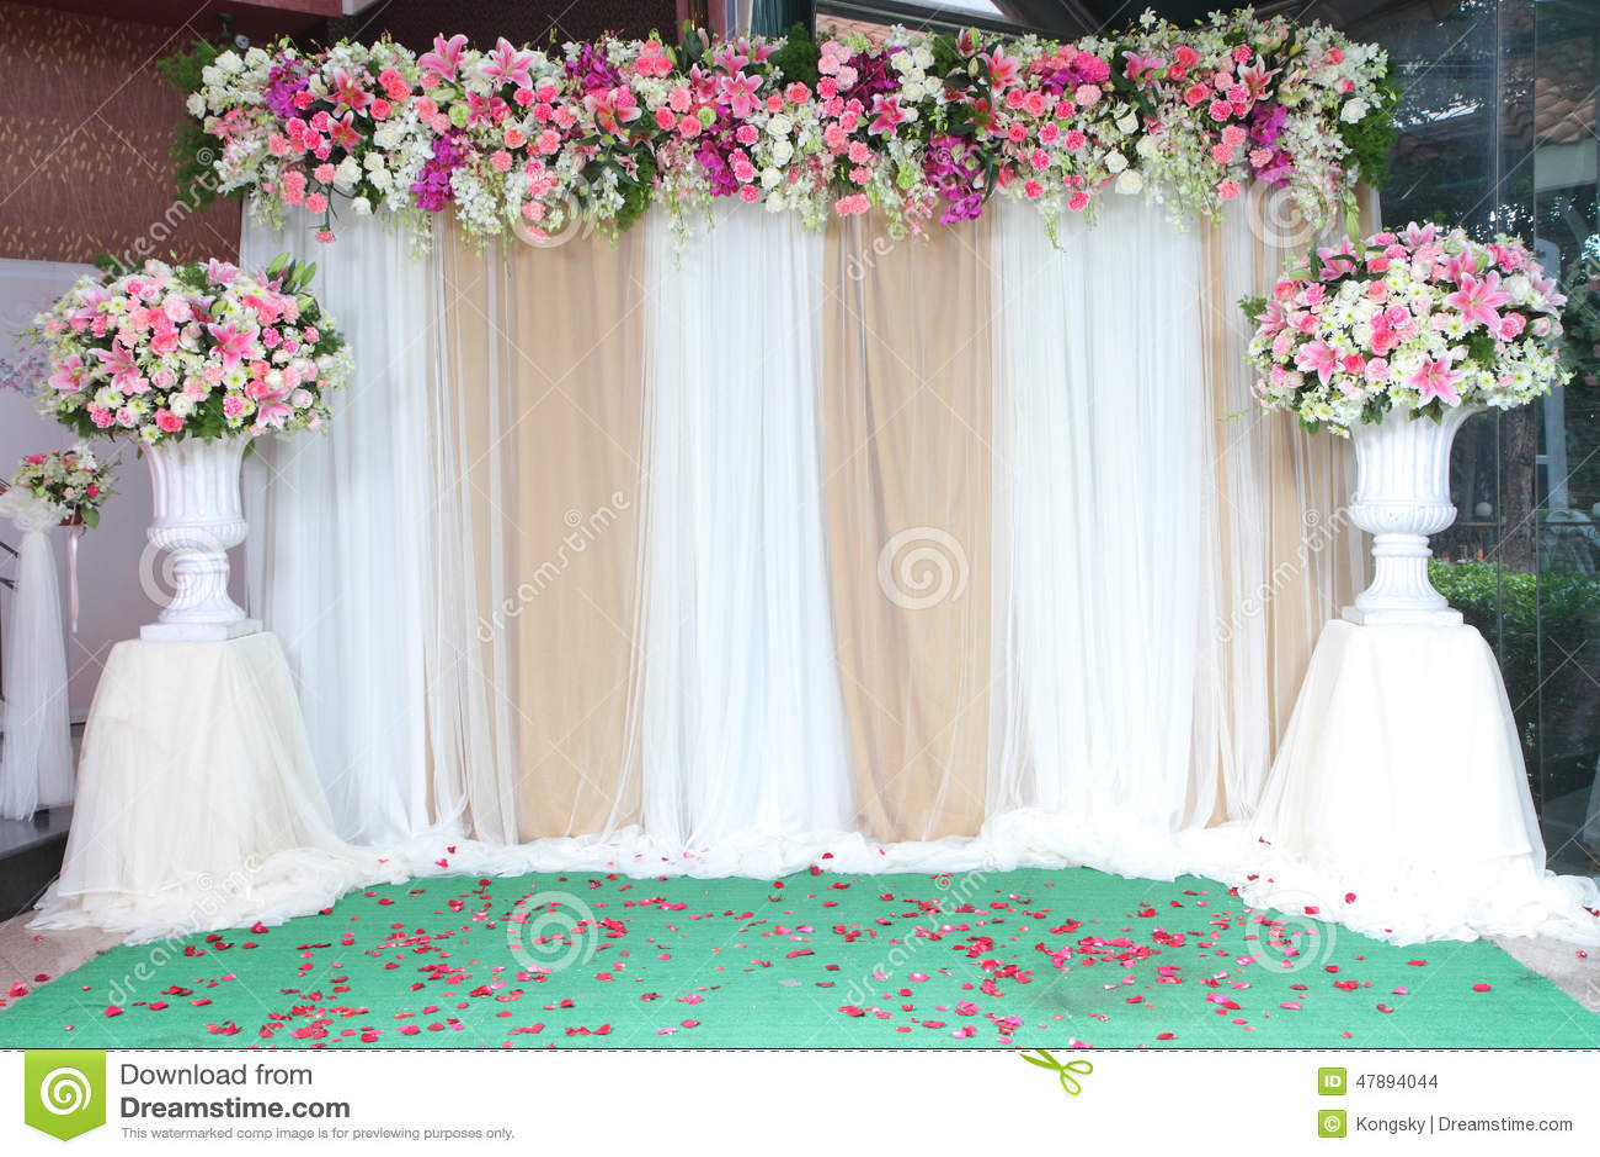 backdrop-flowers-arrangement-wedding-ceremony-colorful-white-gold-fabric-ready-47894044.jpg